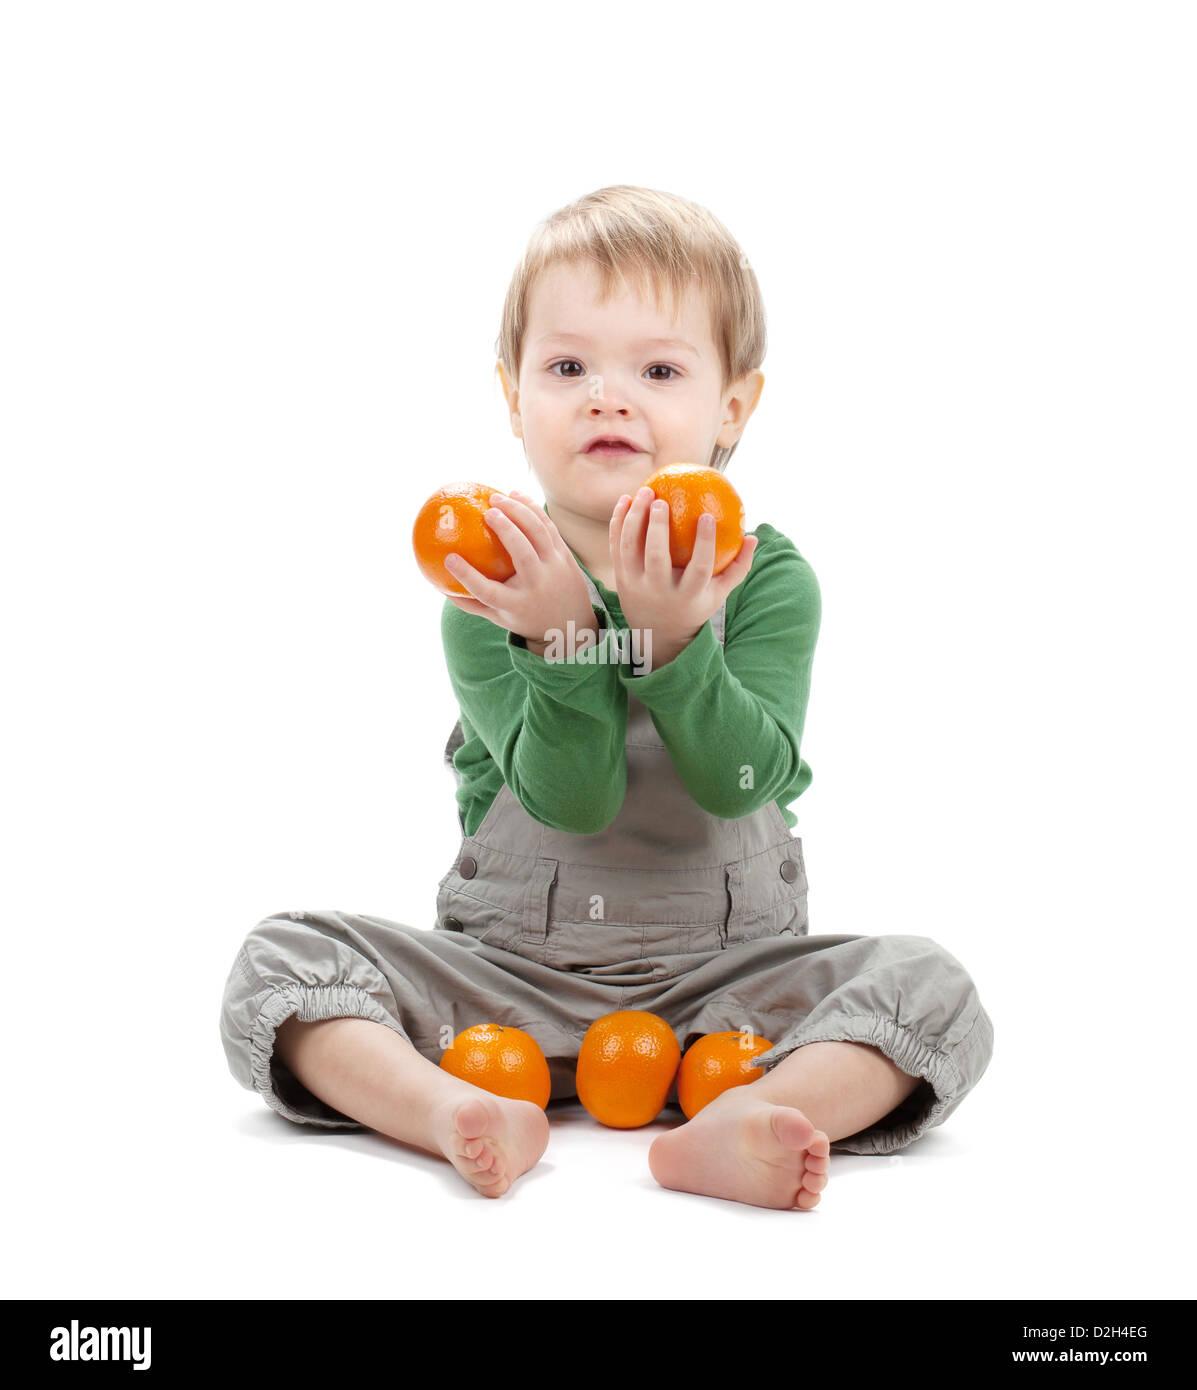 Baby with oranges. Isolated on white background - Stock Image